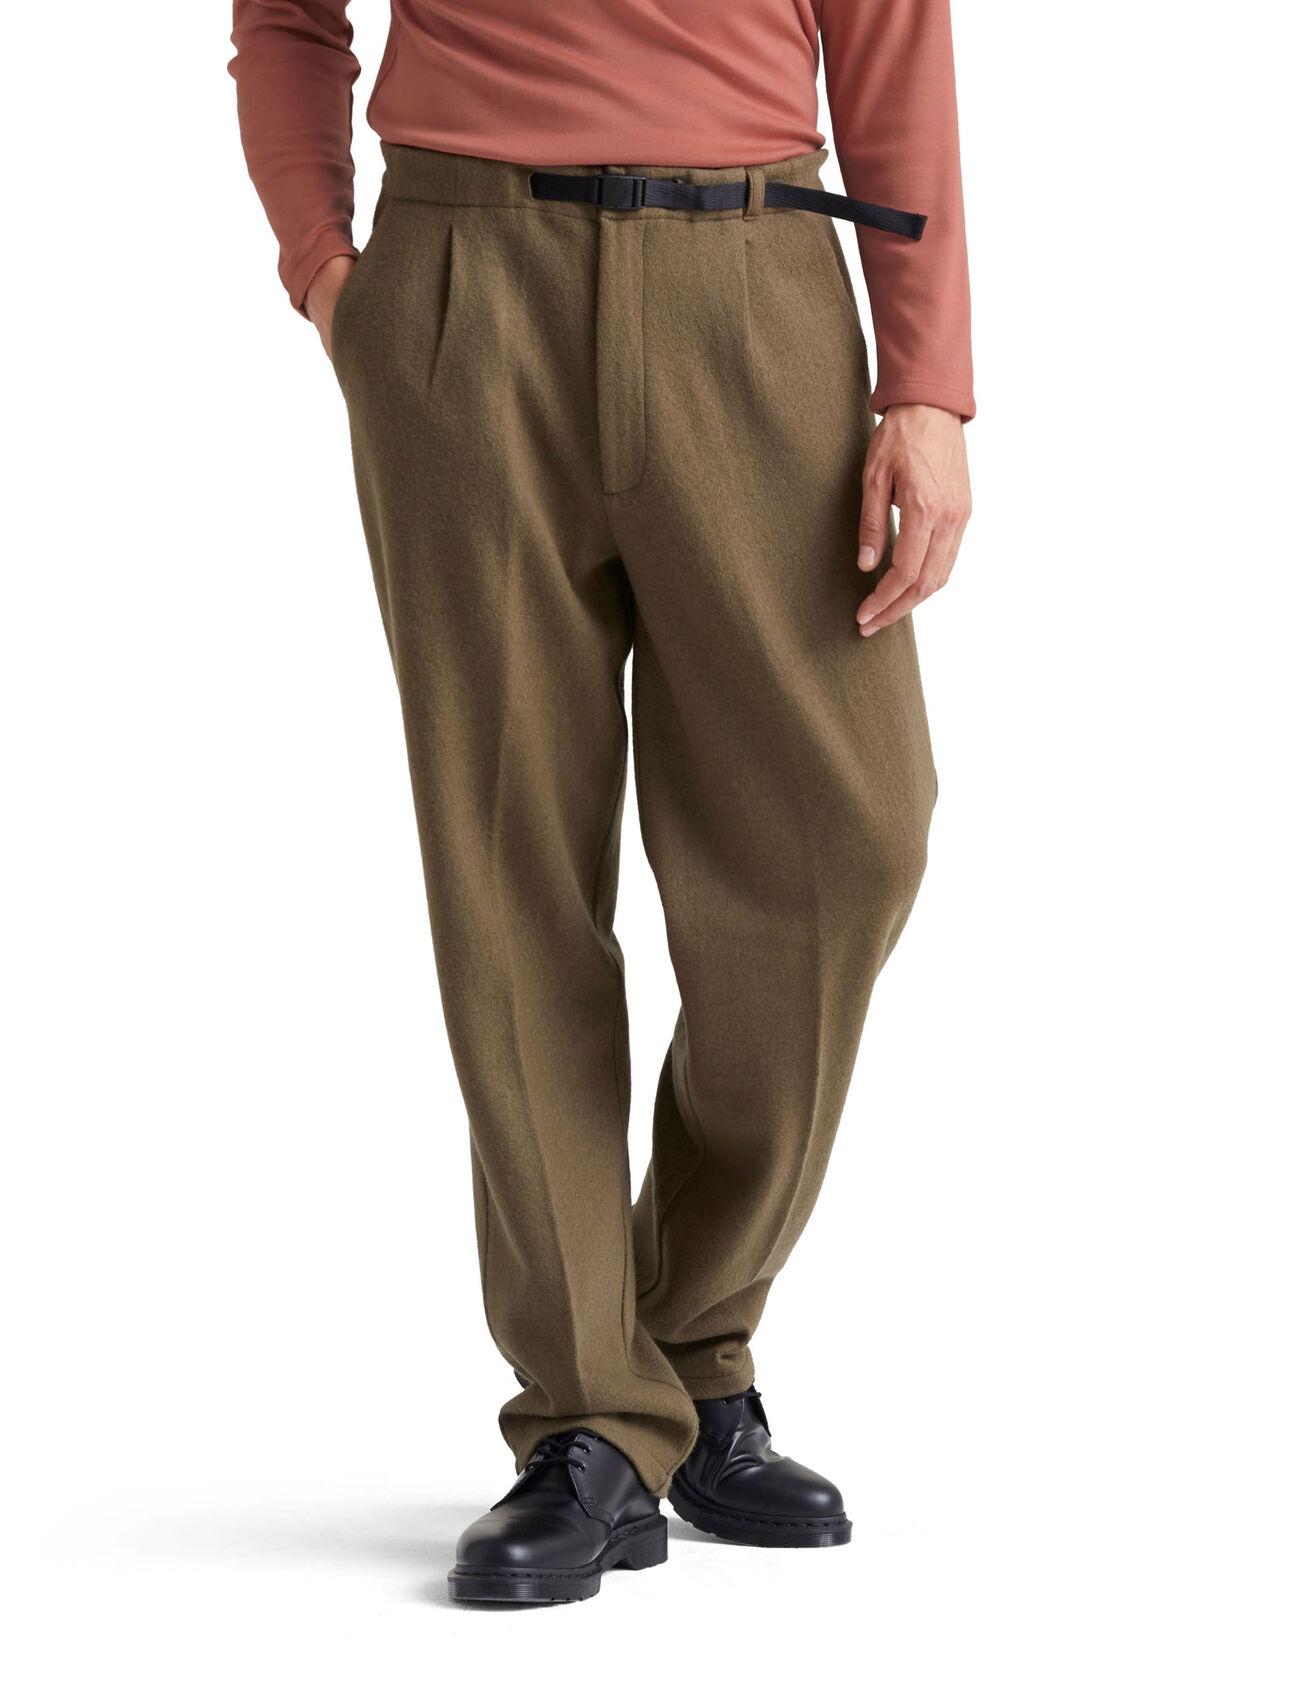 icebreaker x Goldwin合作款美丽诺羊毛长裤